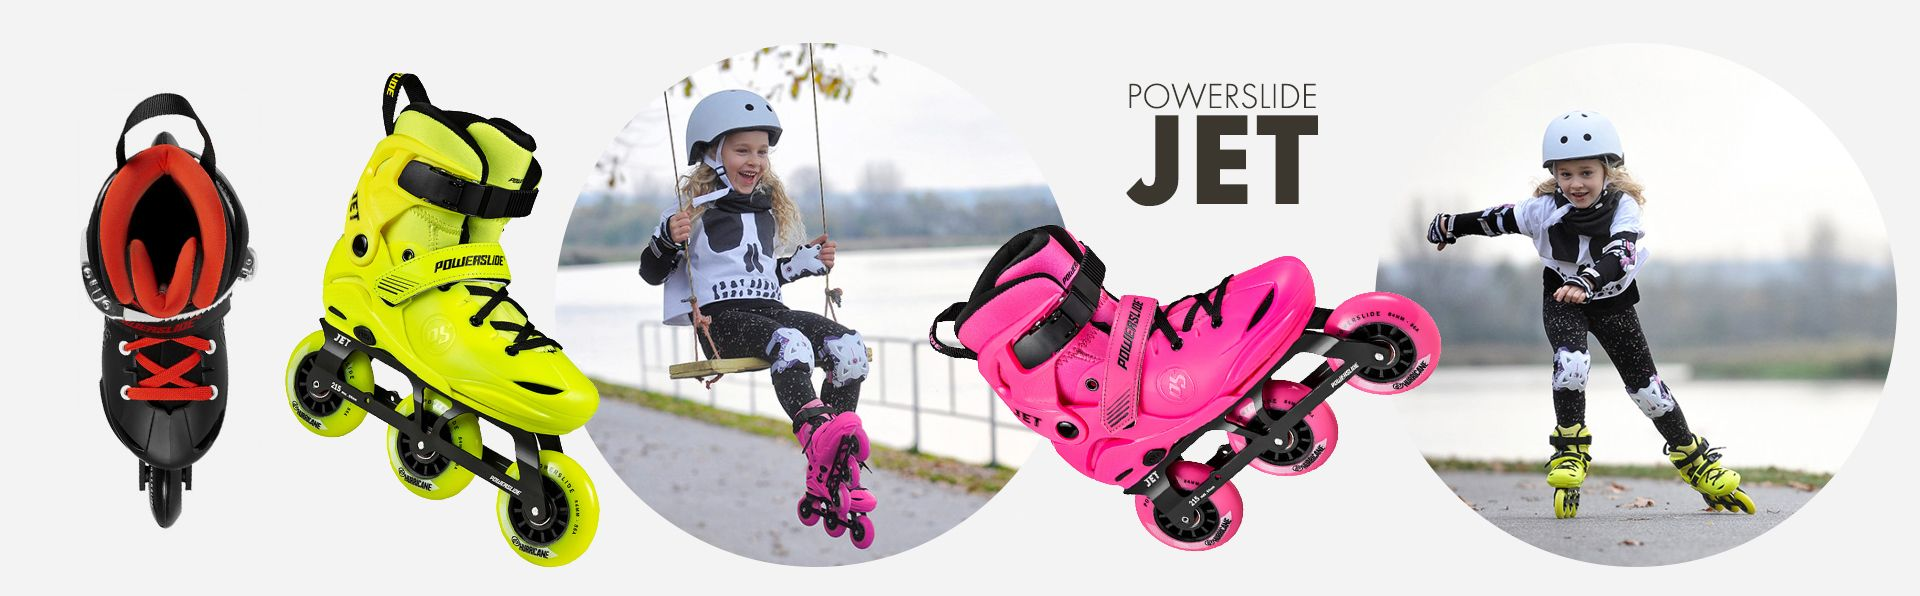 Powerslide - Jet